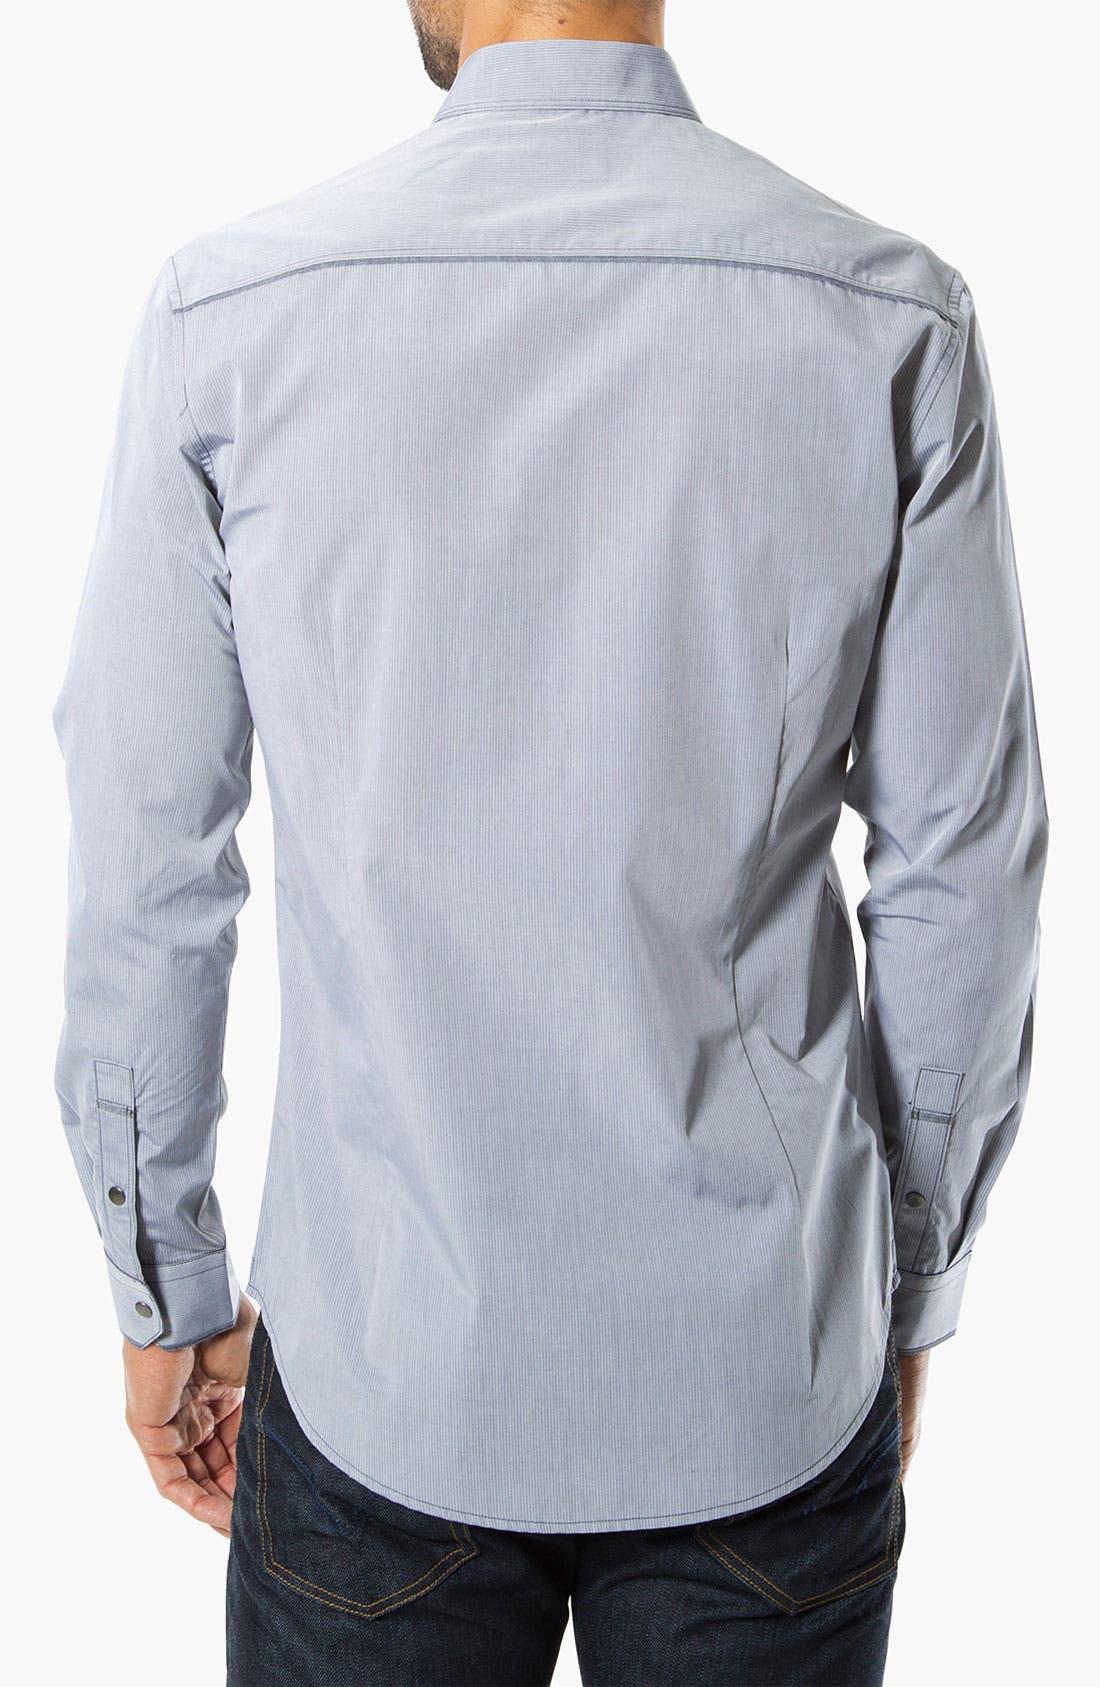 'Shades of Grey' Woven Sport Shirt,                             Alternate thumbnail 2, color,                             020